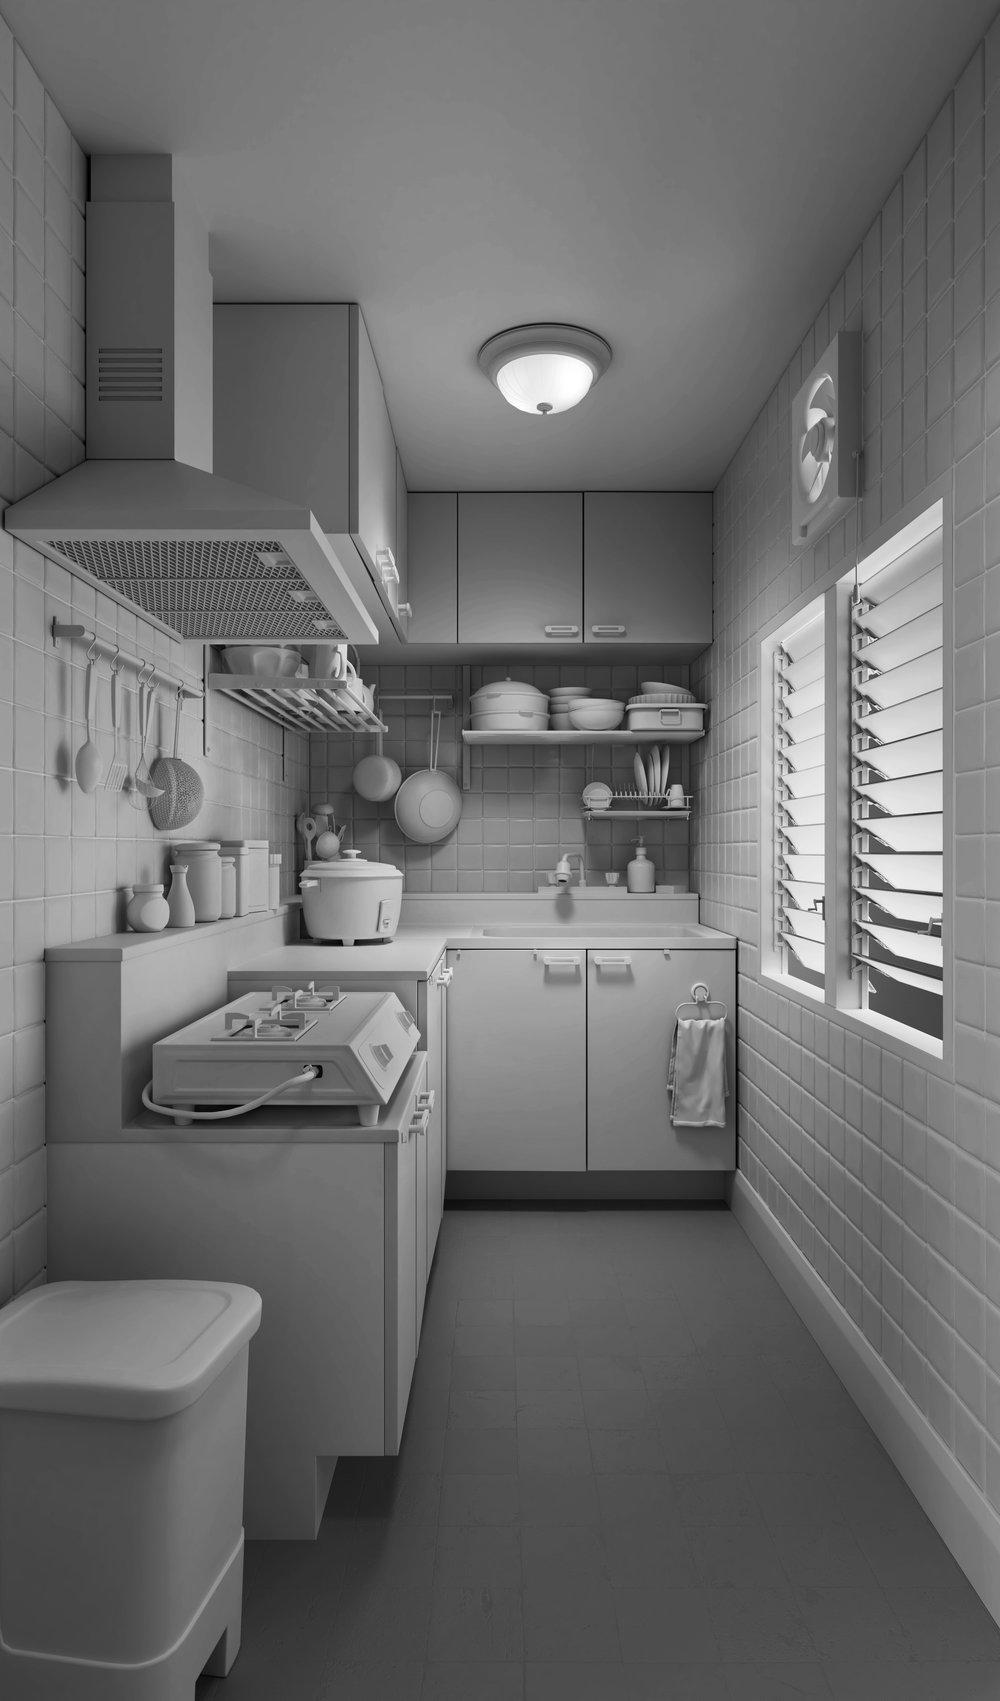 C_kitchen_5_Model_Final_RGB.jpg